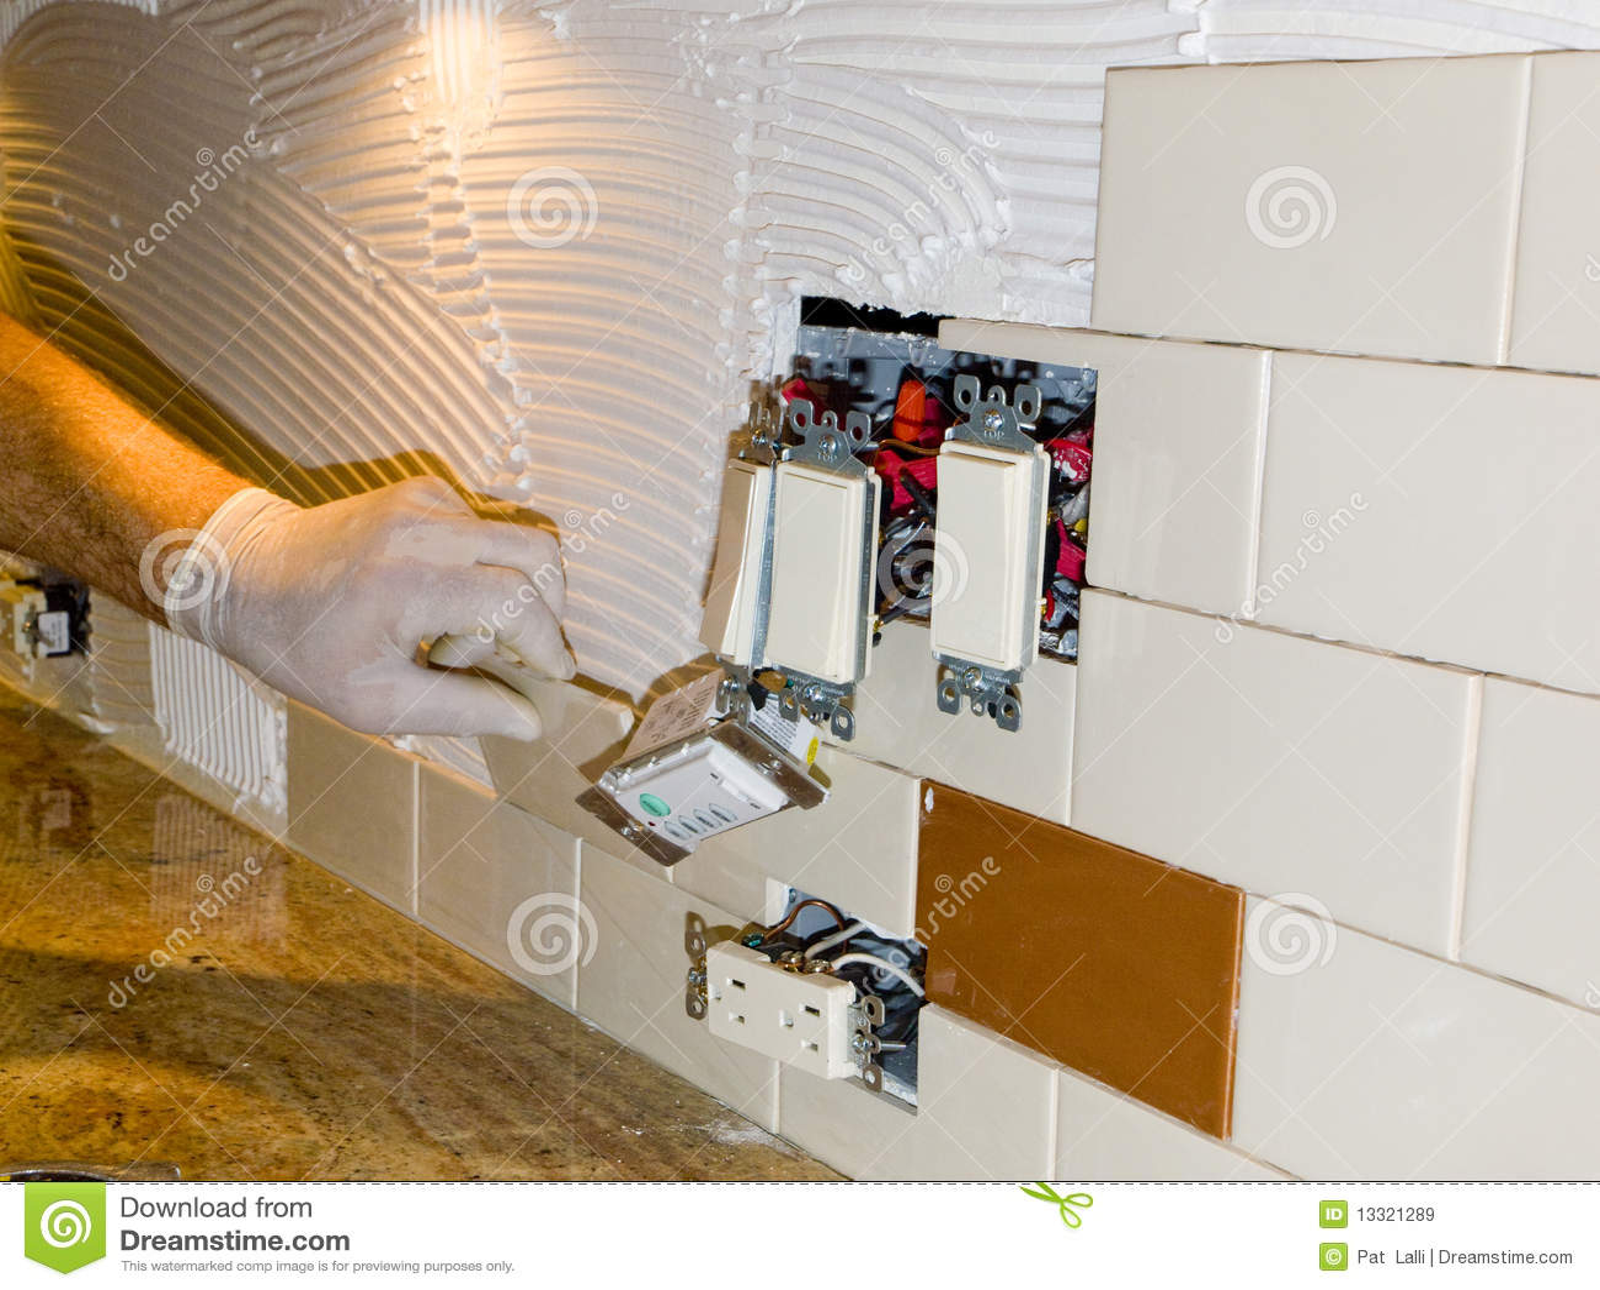 royalty free stock images ceramic tile installation kitchen backsplash 10 image installing kitchen backsplash Ceramic tile installation on kitchen backsplash 10